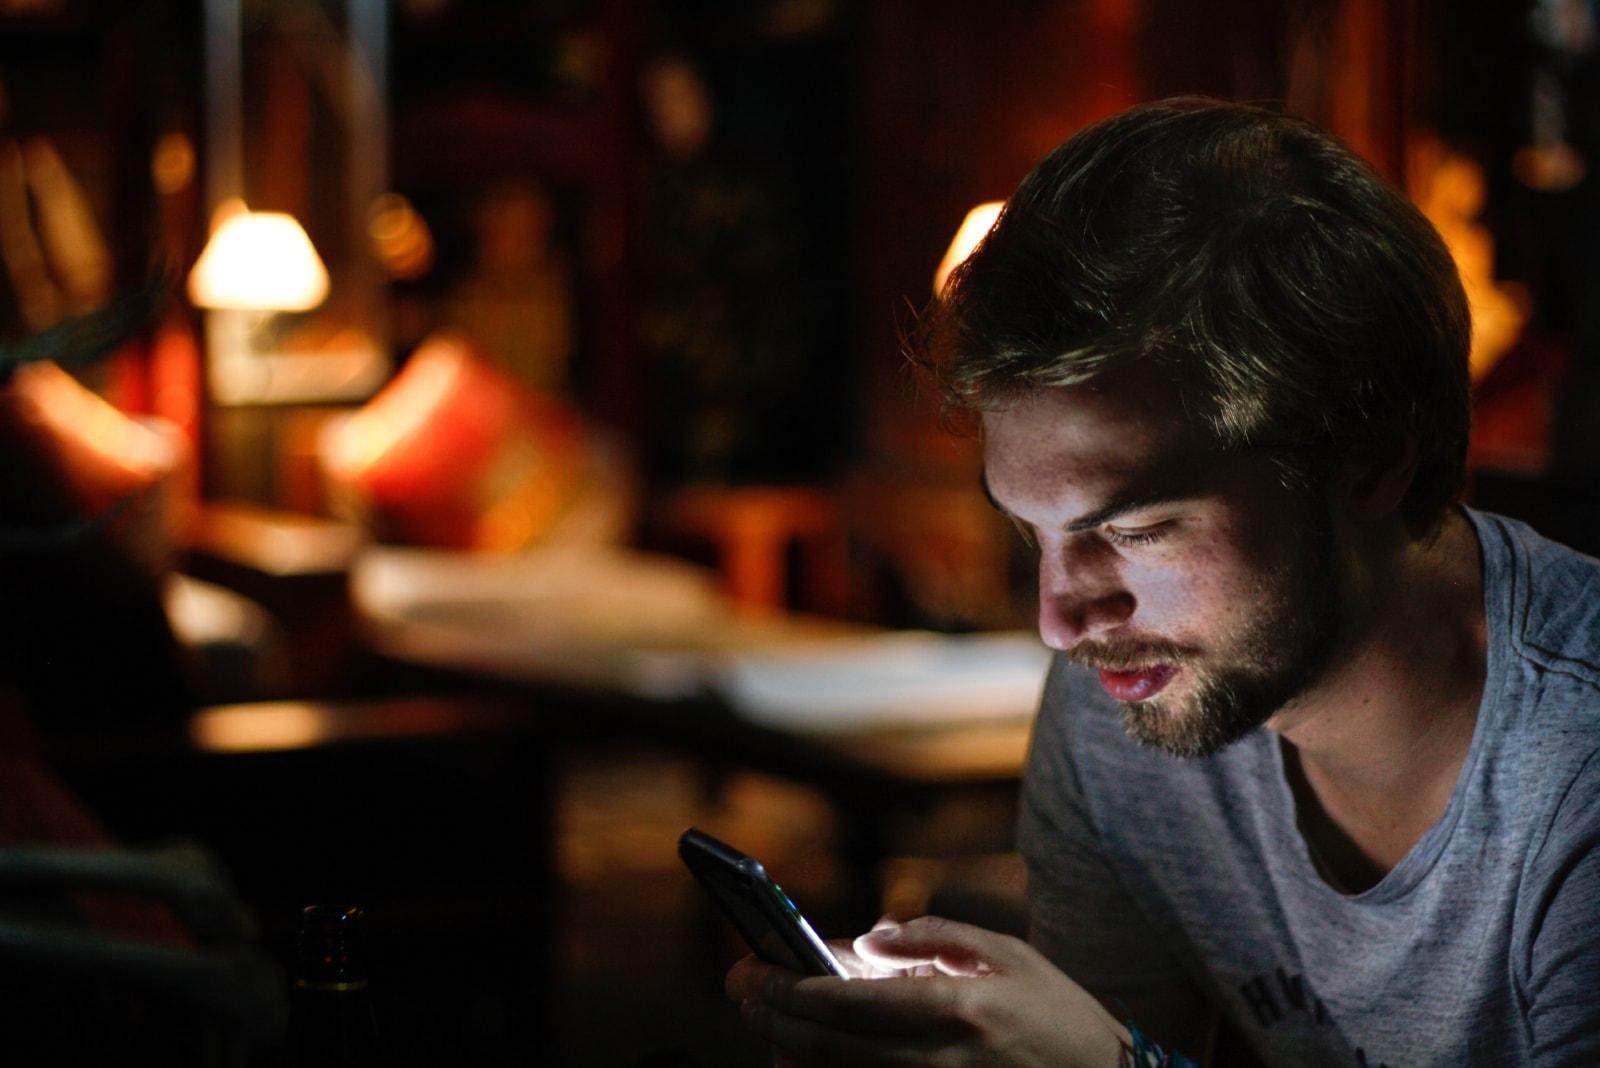 man in gray t-shirt using phone indoor